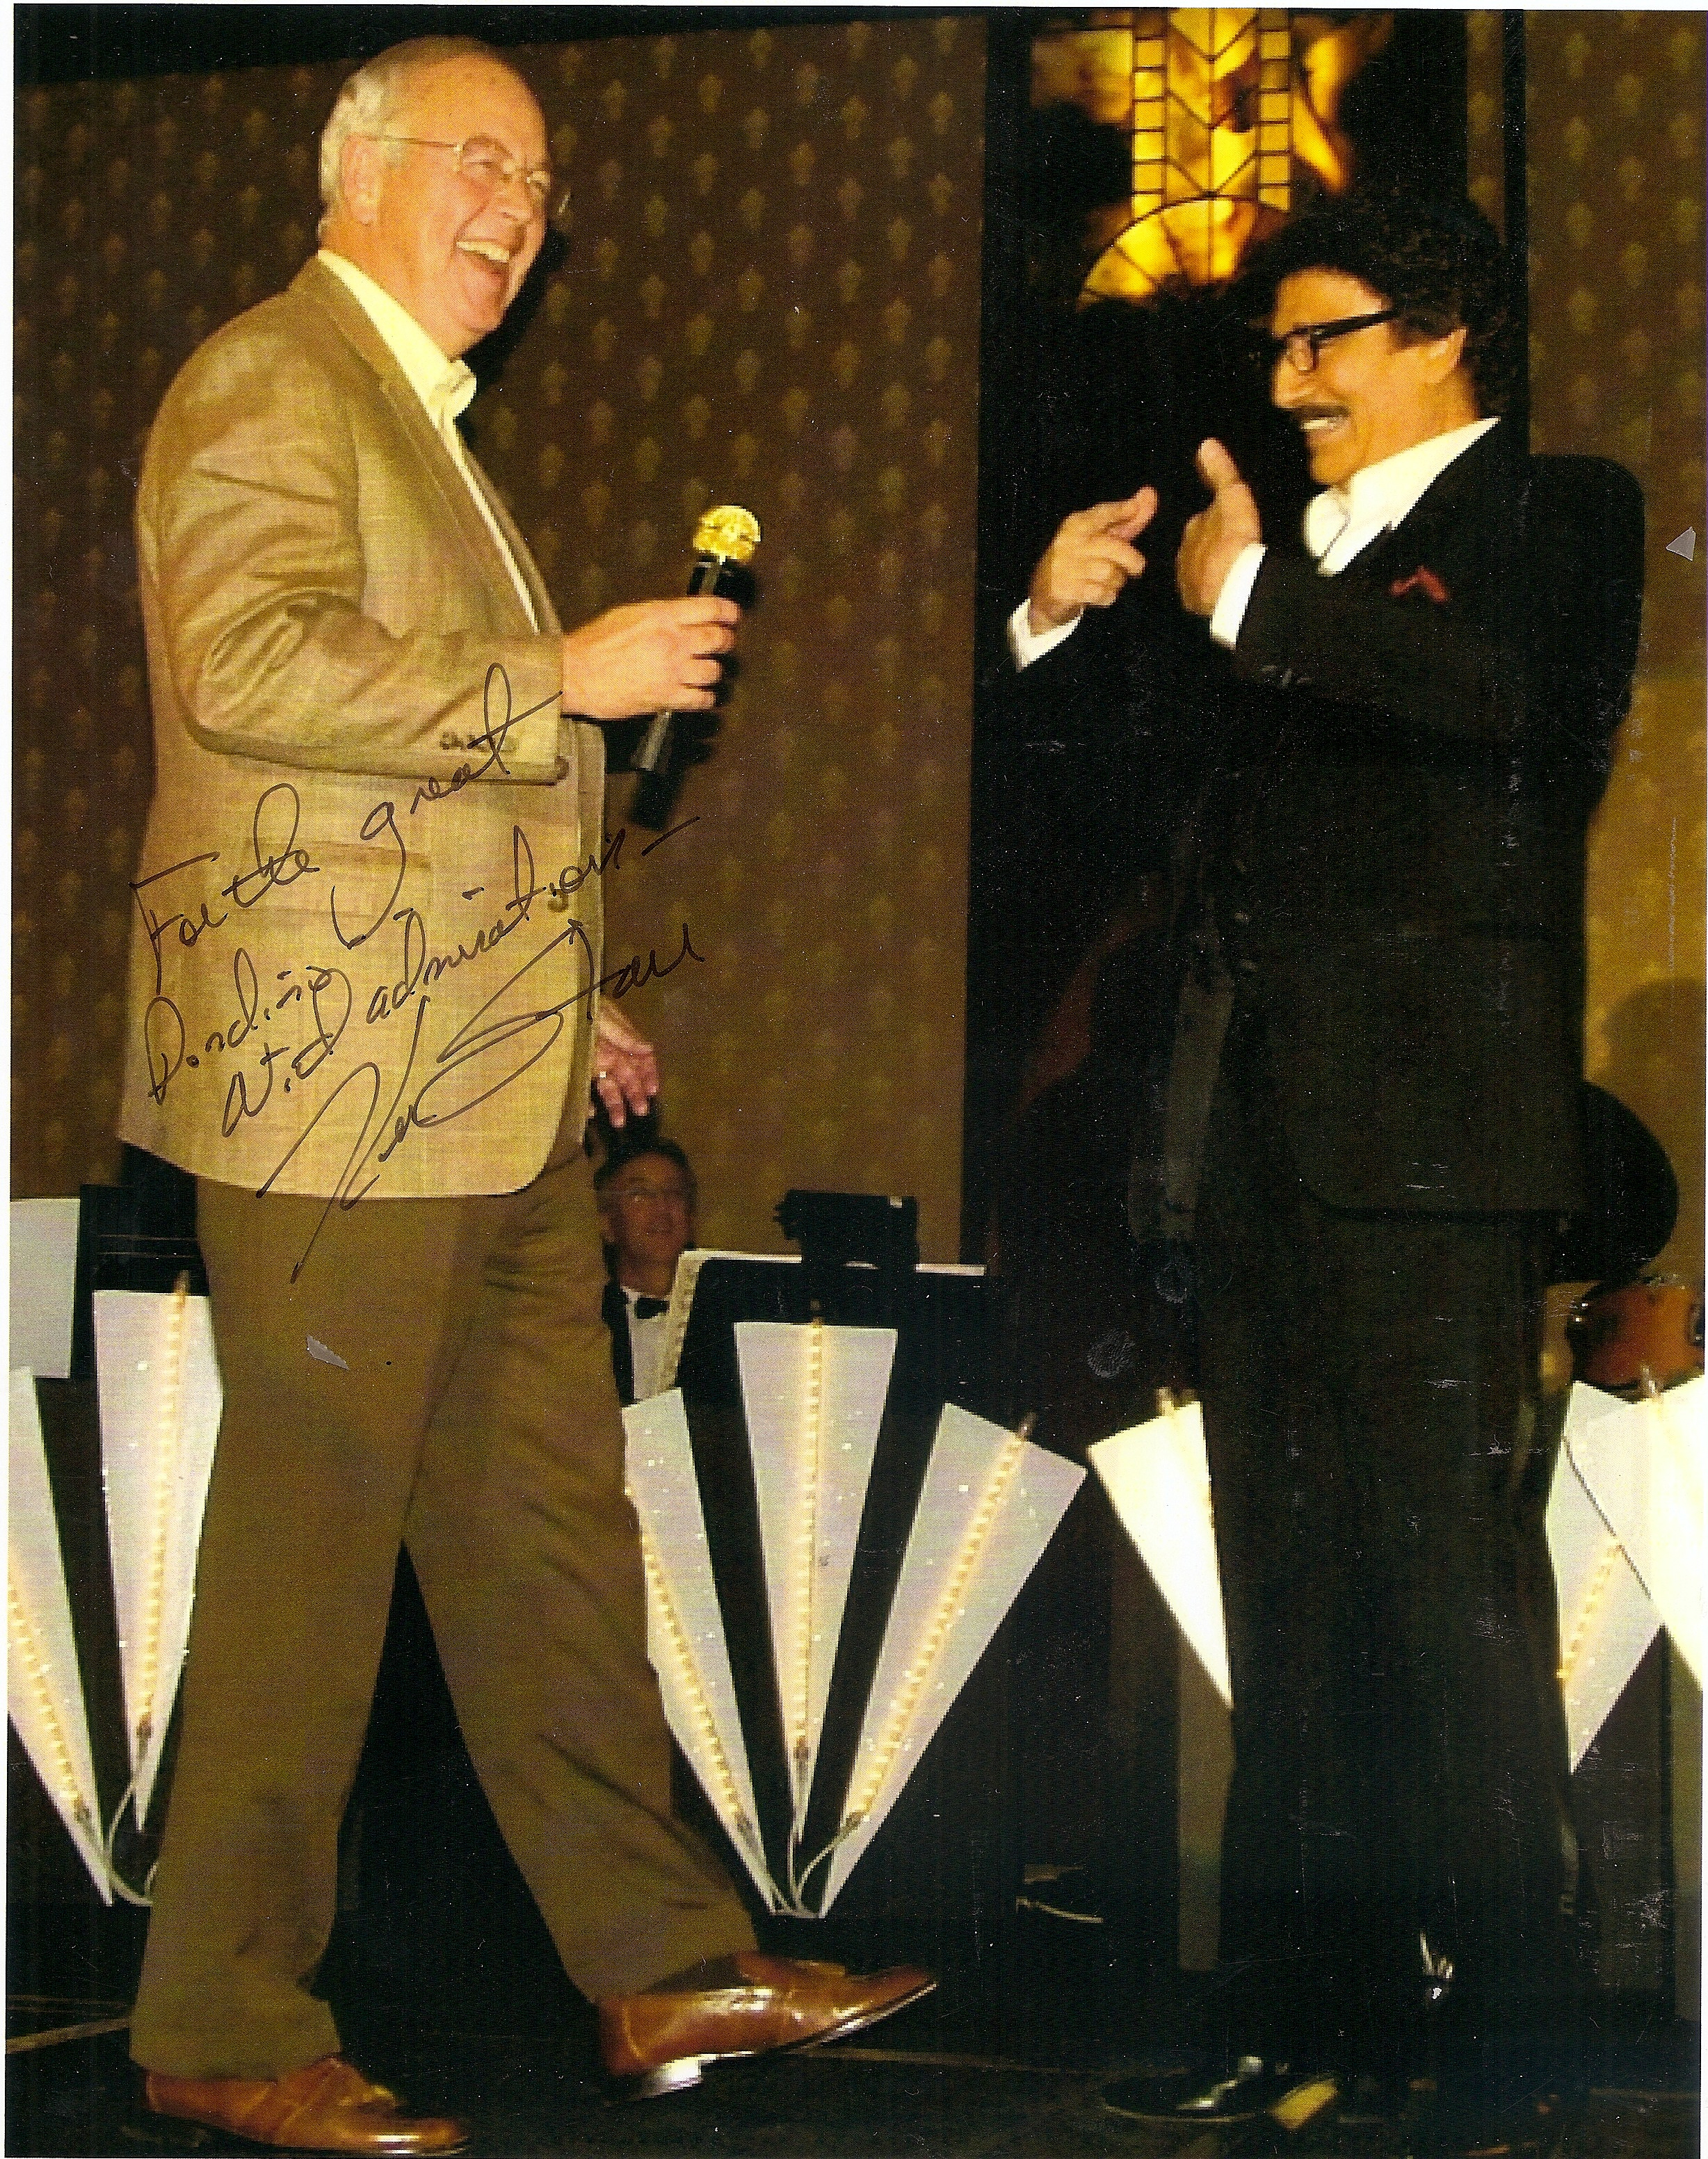 Baylor Pres. Ken Starr Dondino